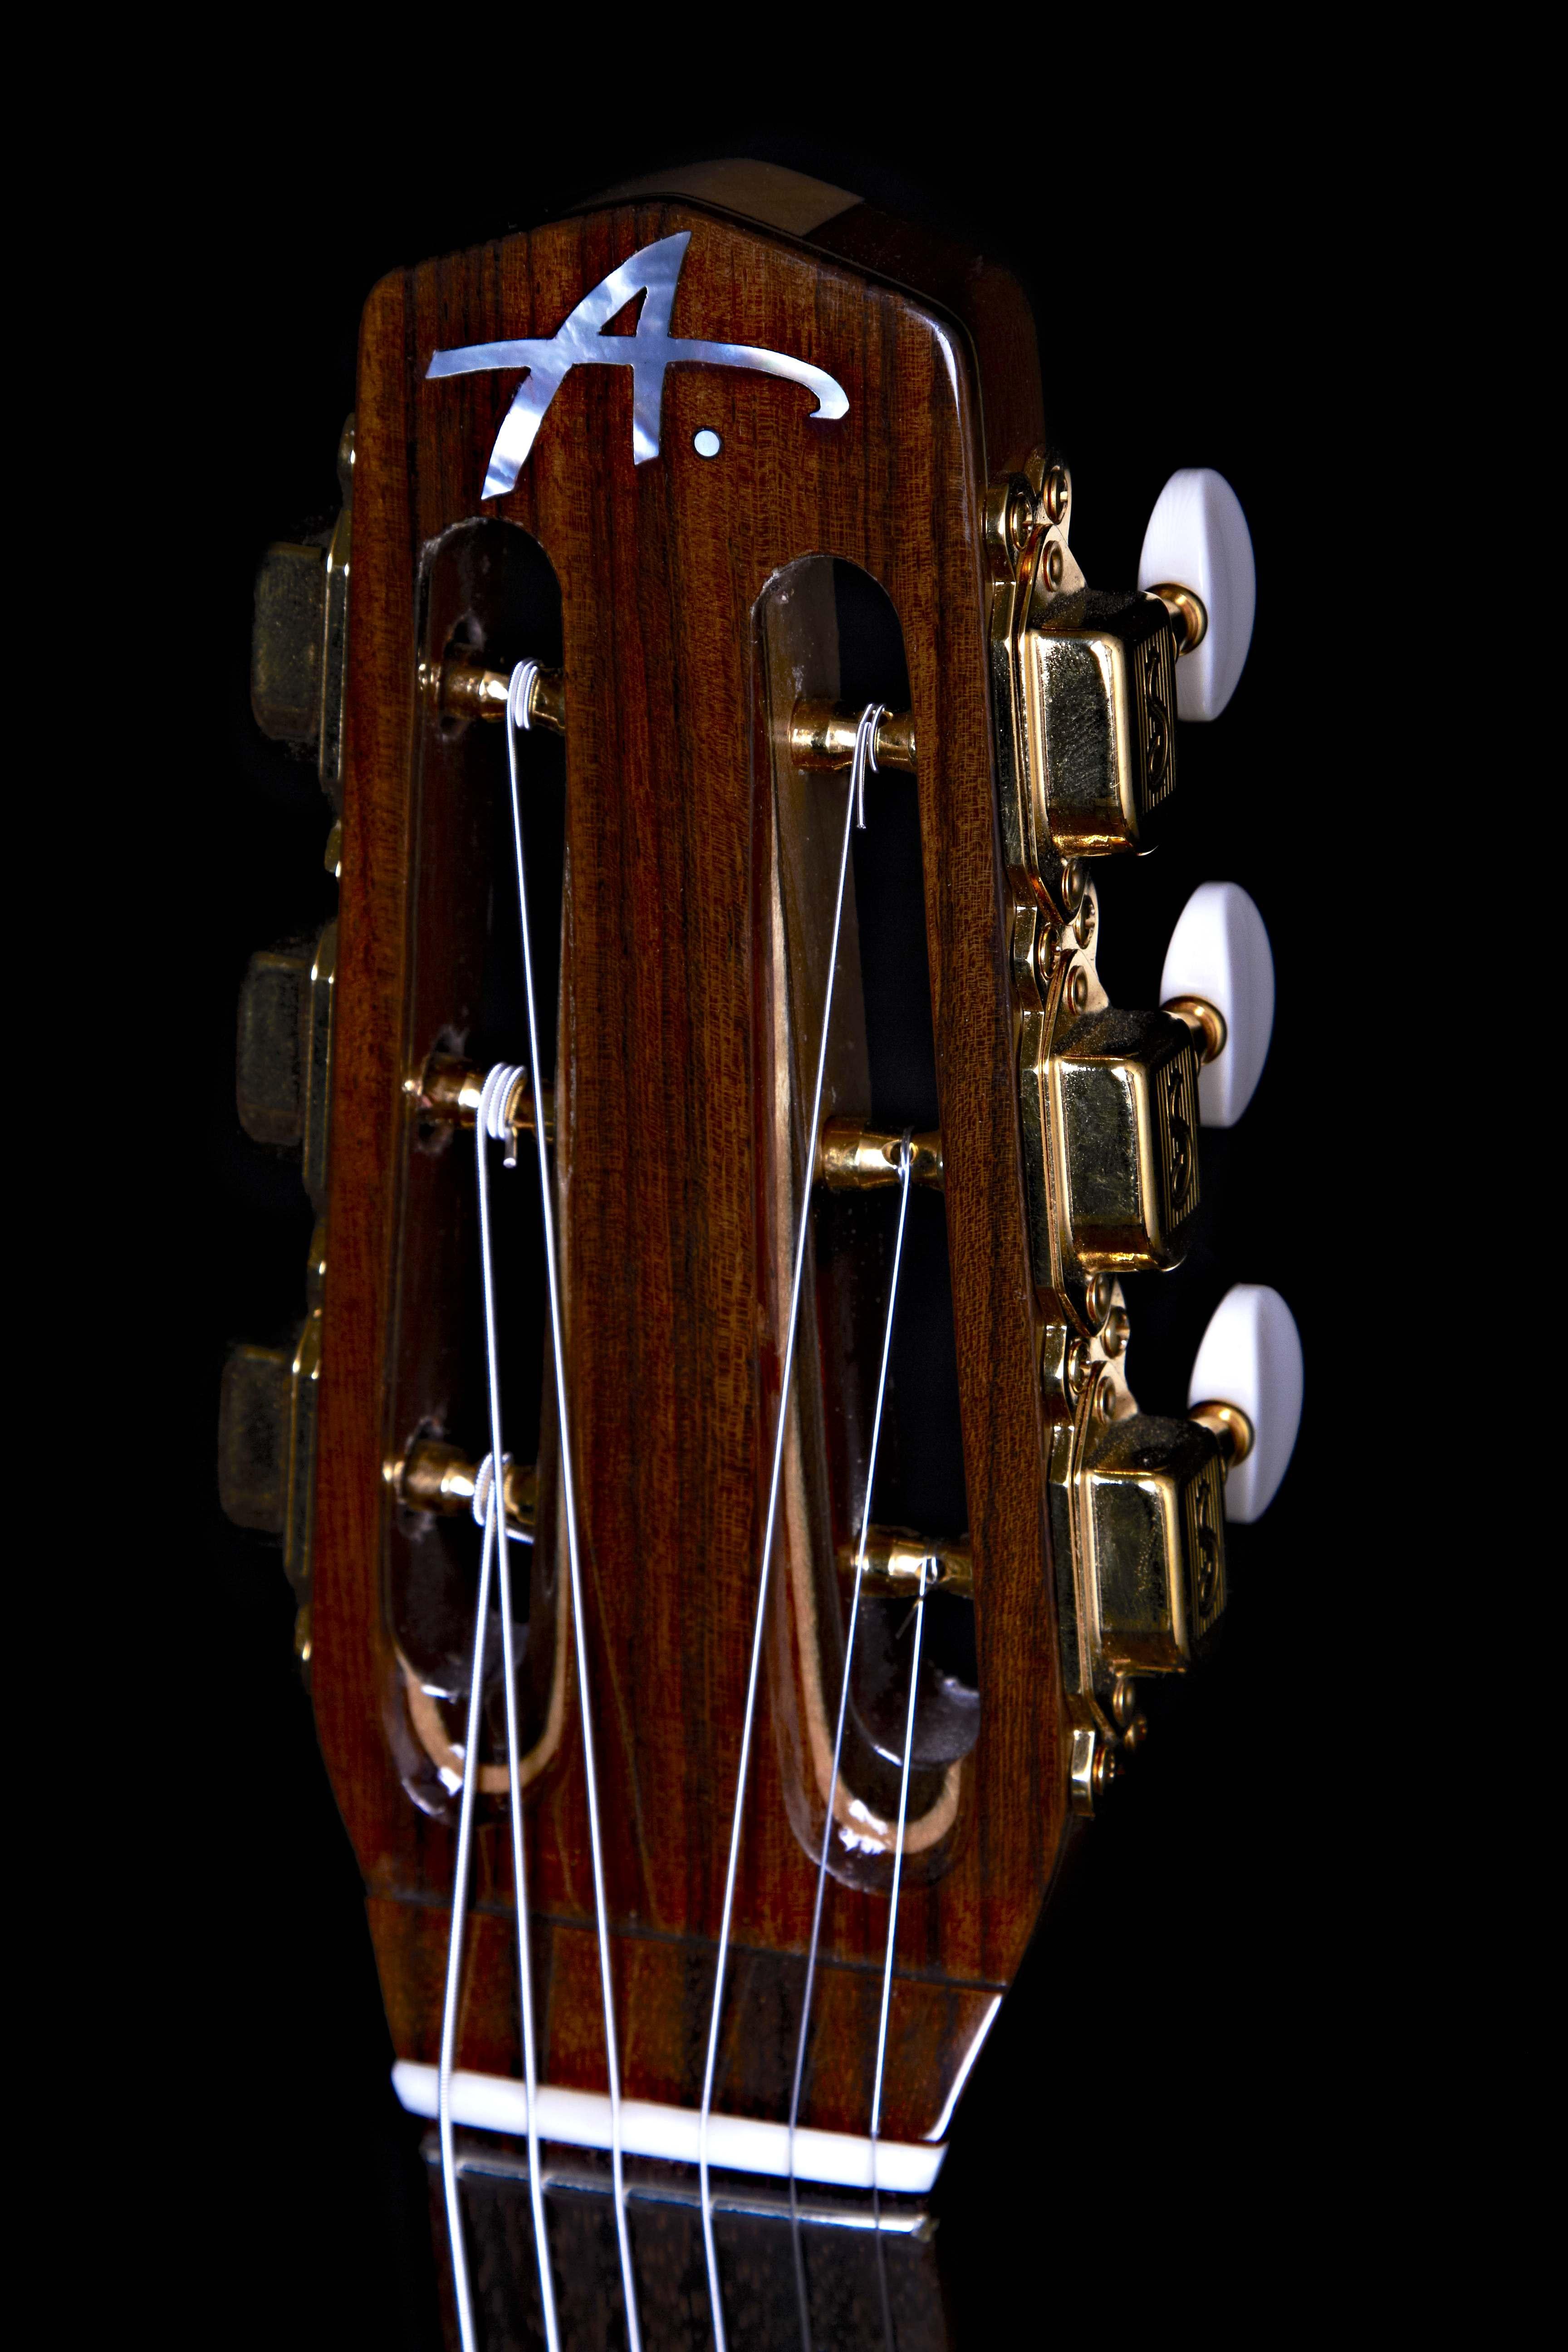 'Kandinskiferri' guitar